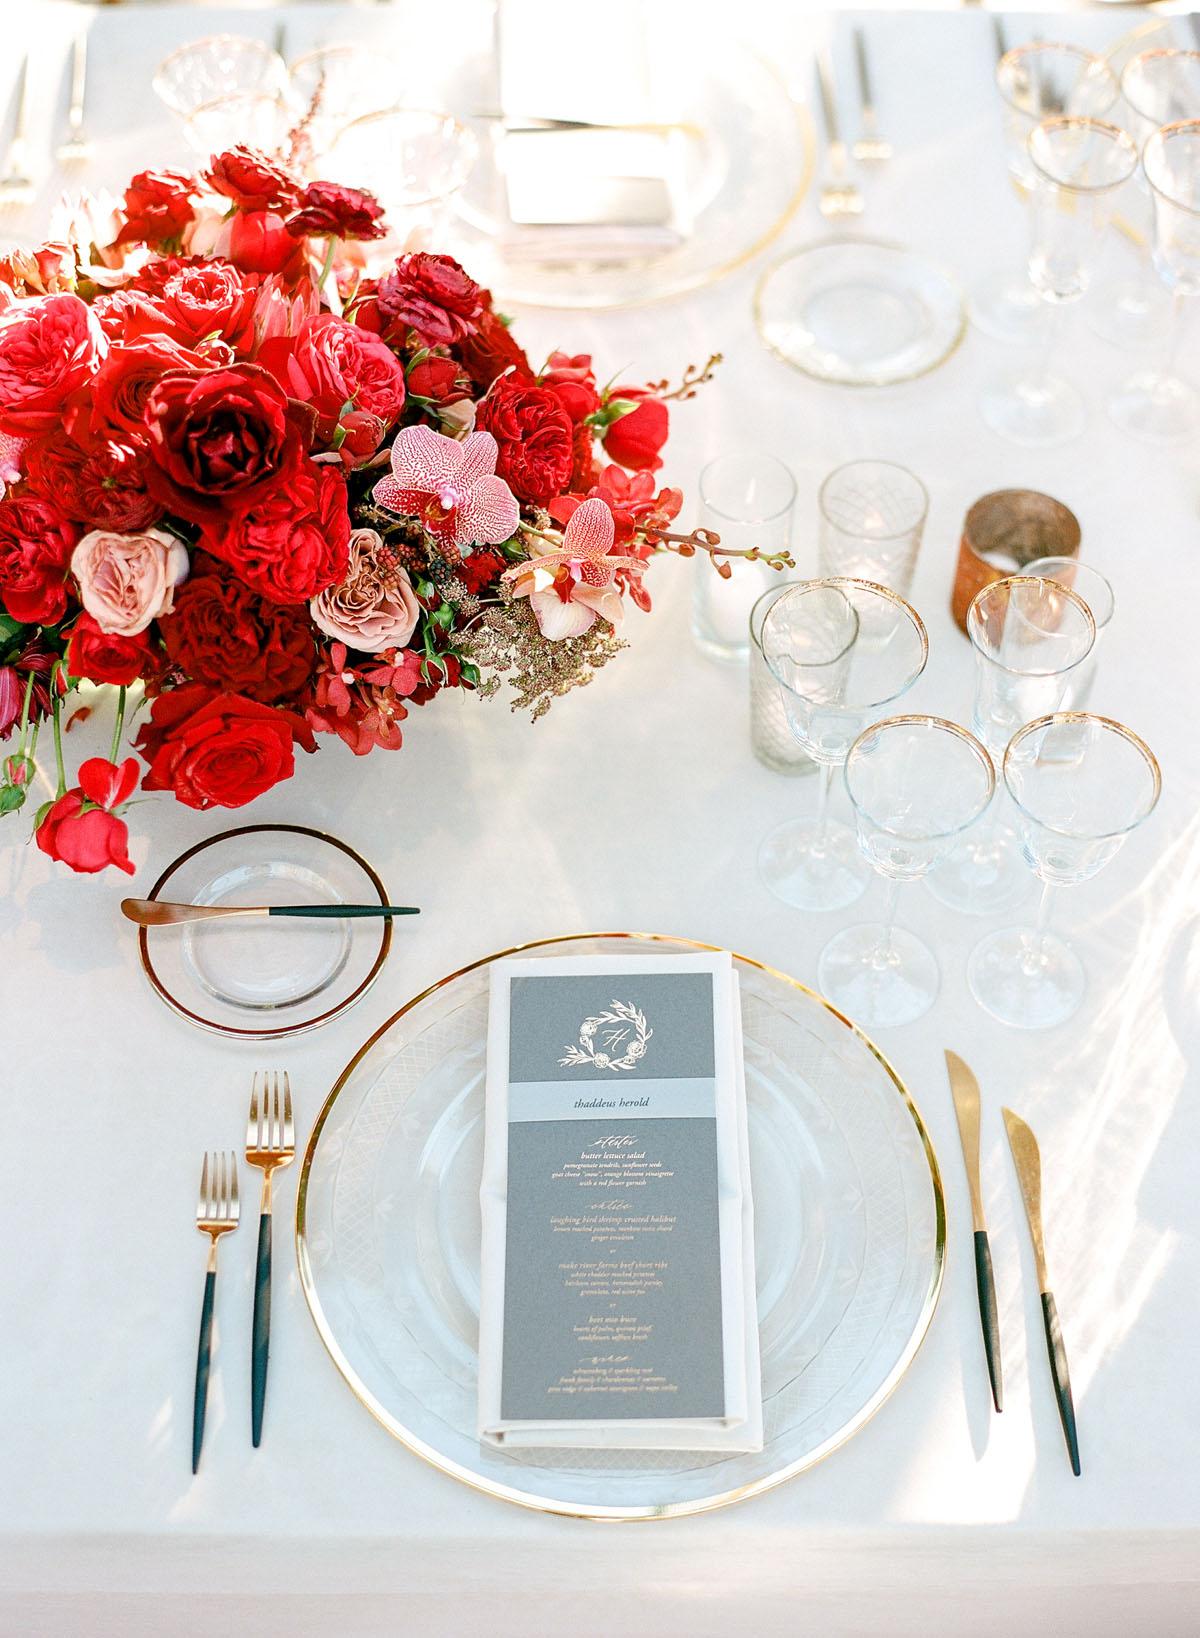 54-white-linen-red-floral-design-tablescape.jpg